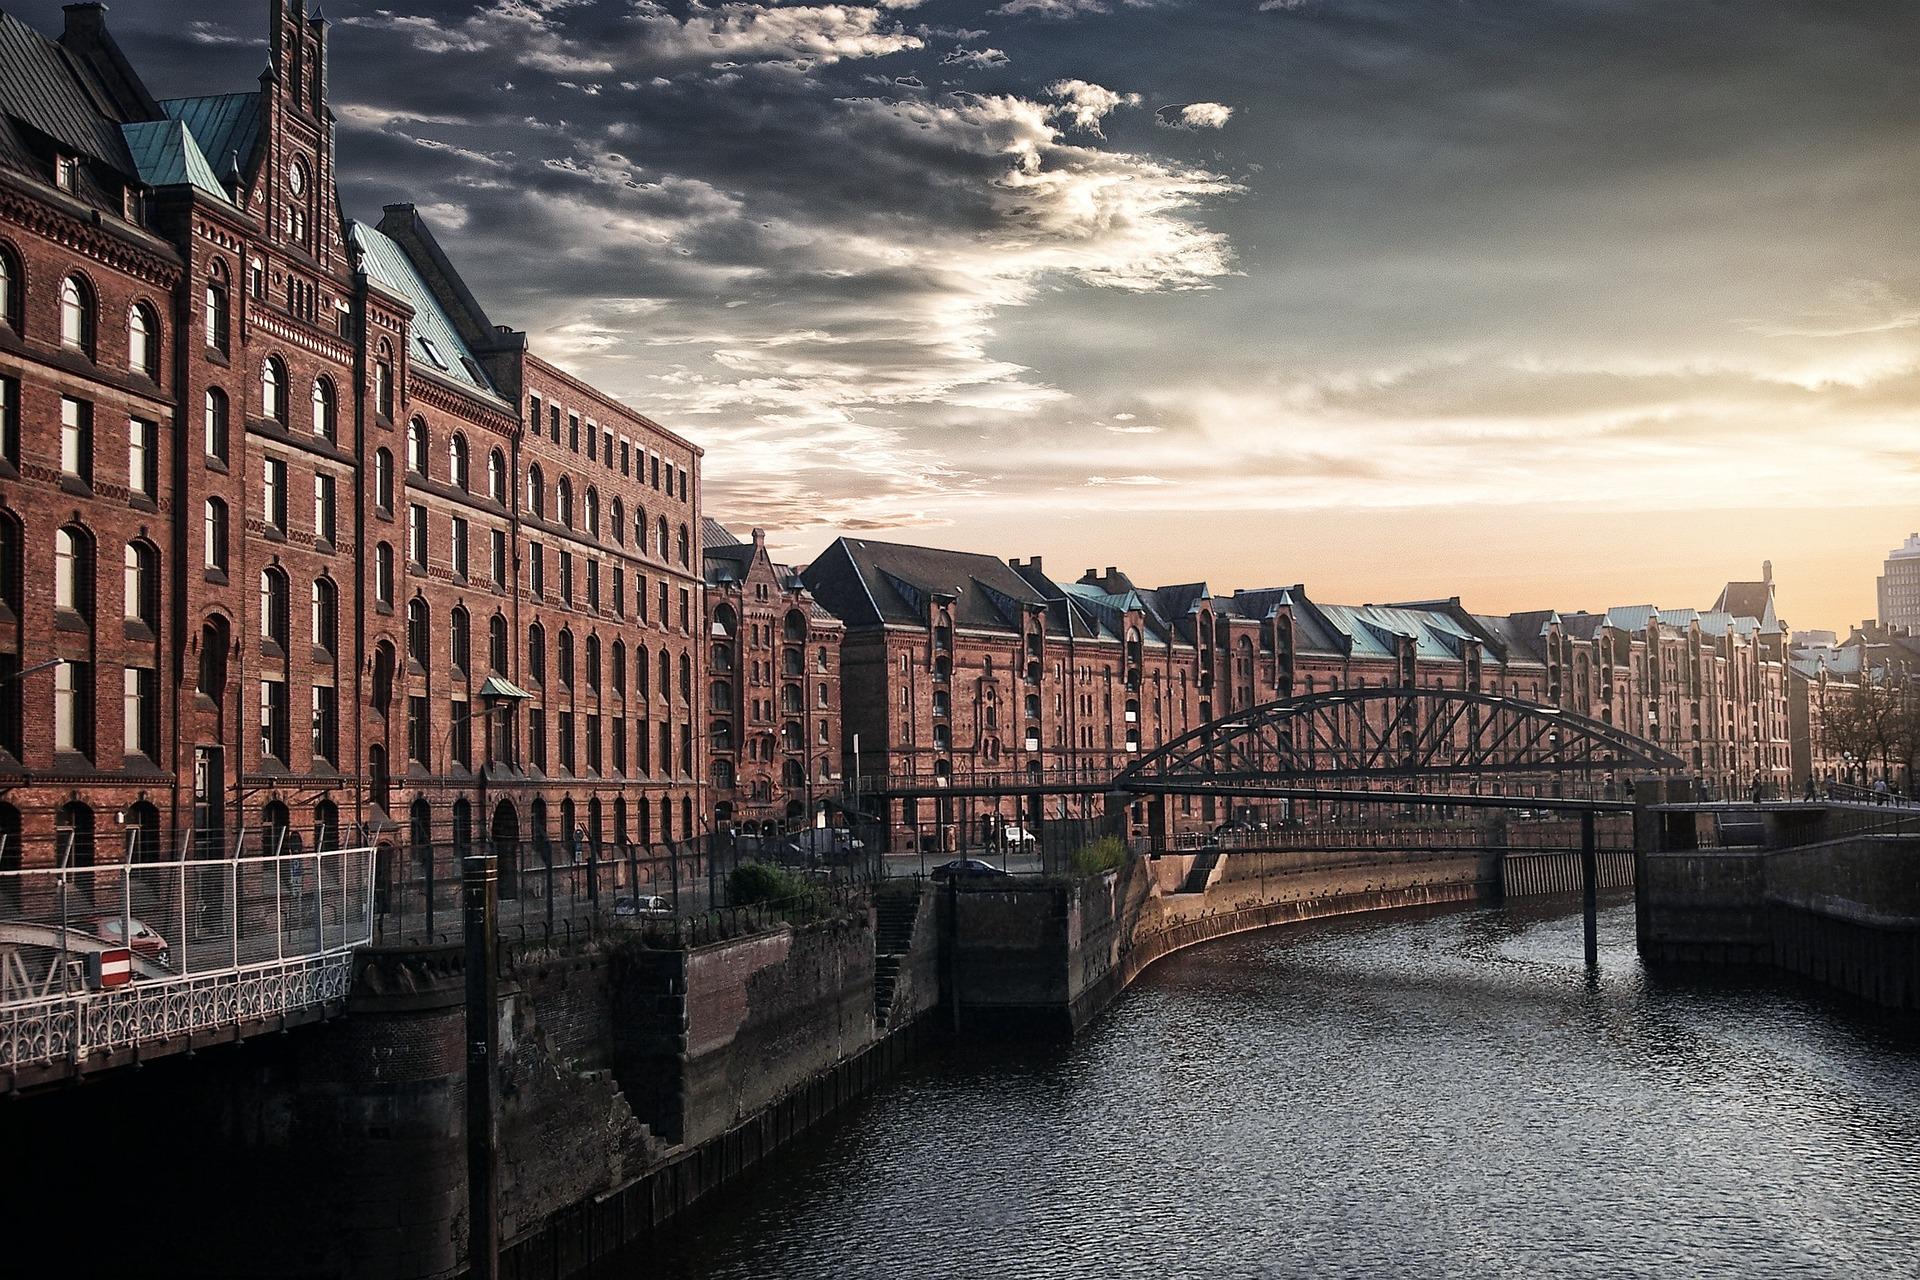 Stadt, Fluss, Brücke, Himmel, Hamburgo - Wallpaper HD - Prof.-falken.com